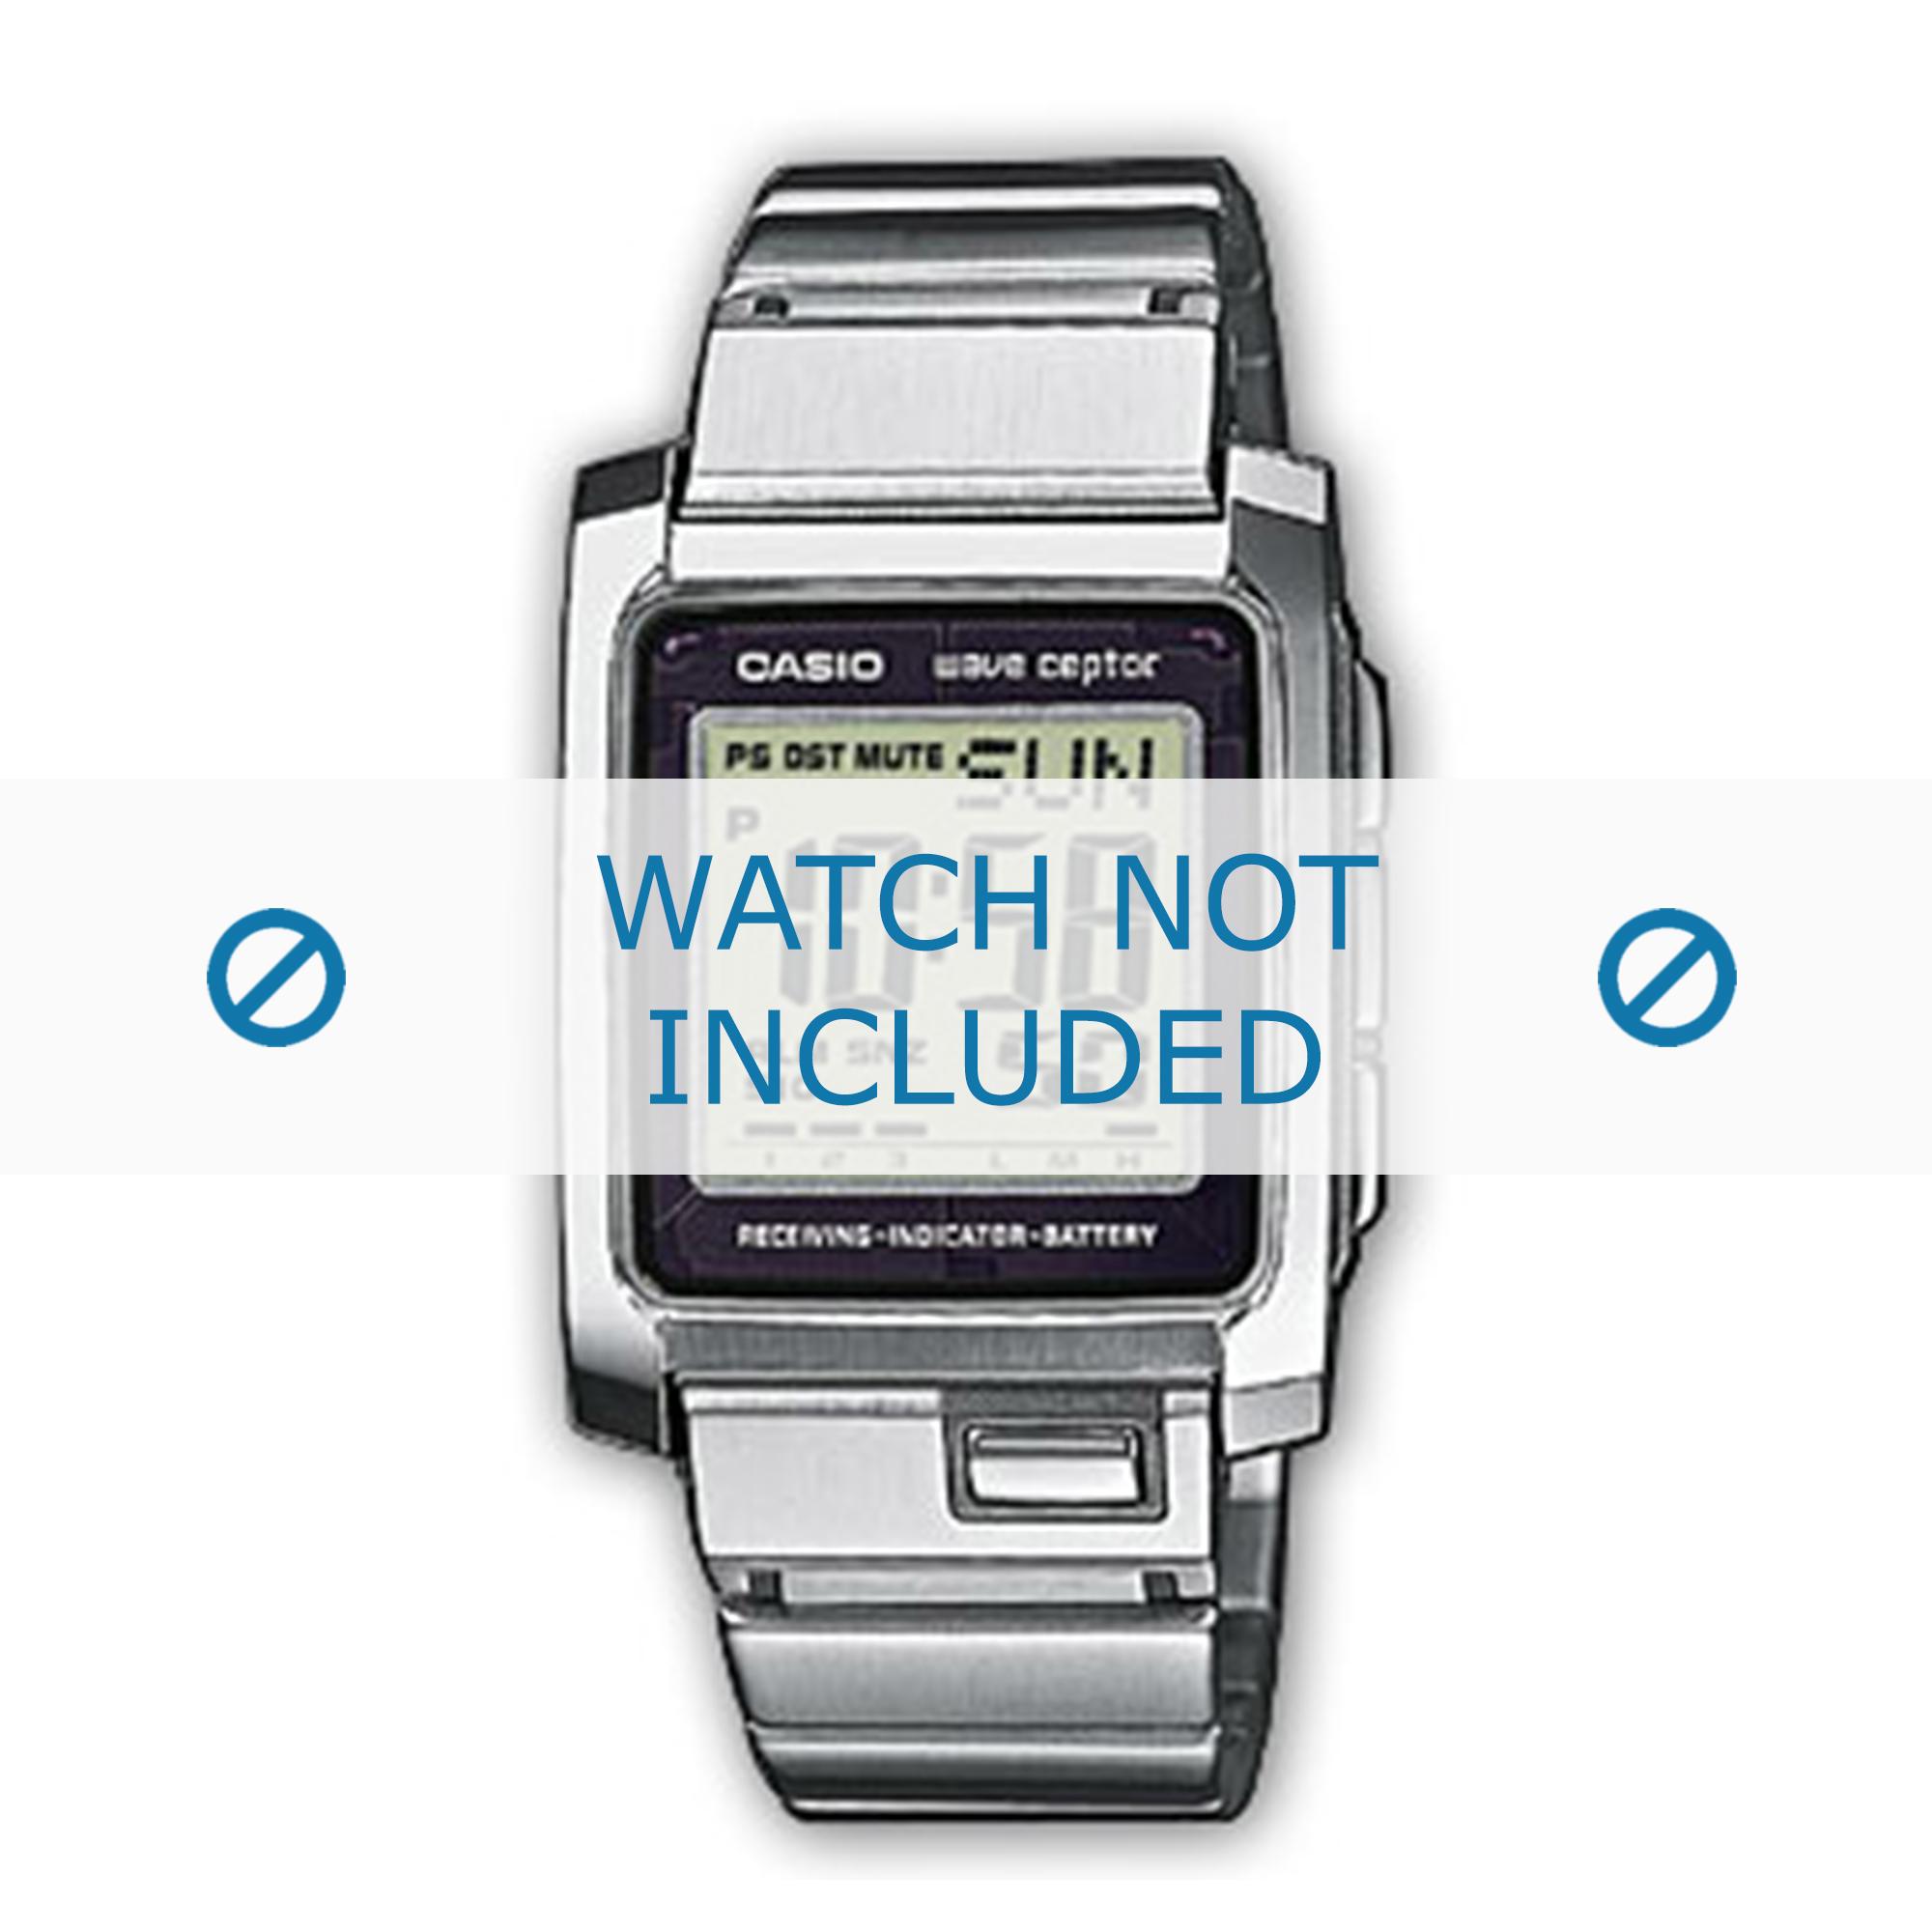 Casio klockarmband 10223696 / WV-300DE-7AER Metall Ilverfärgad